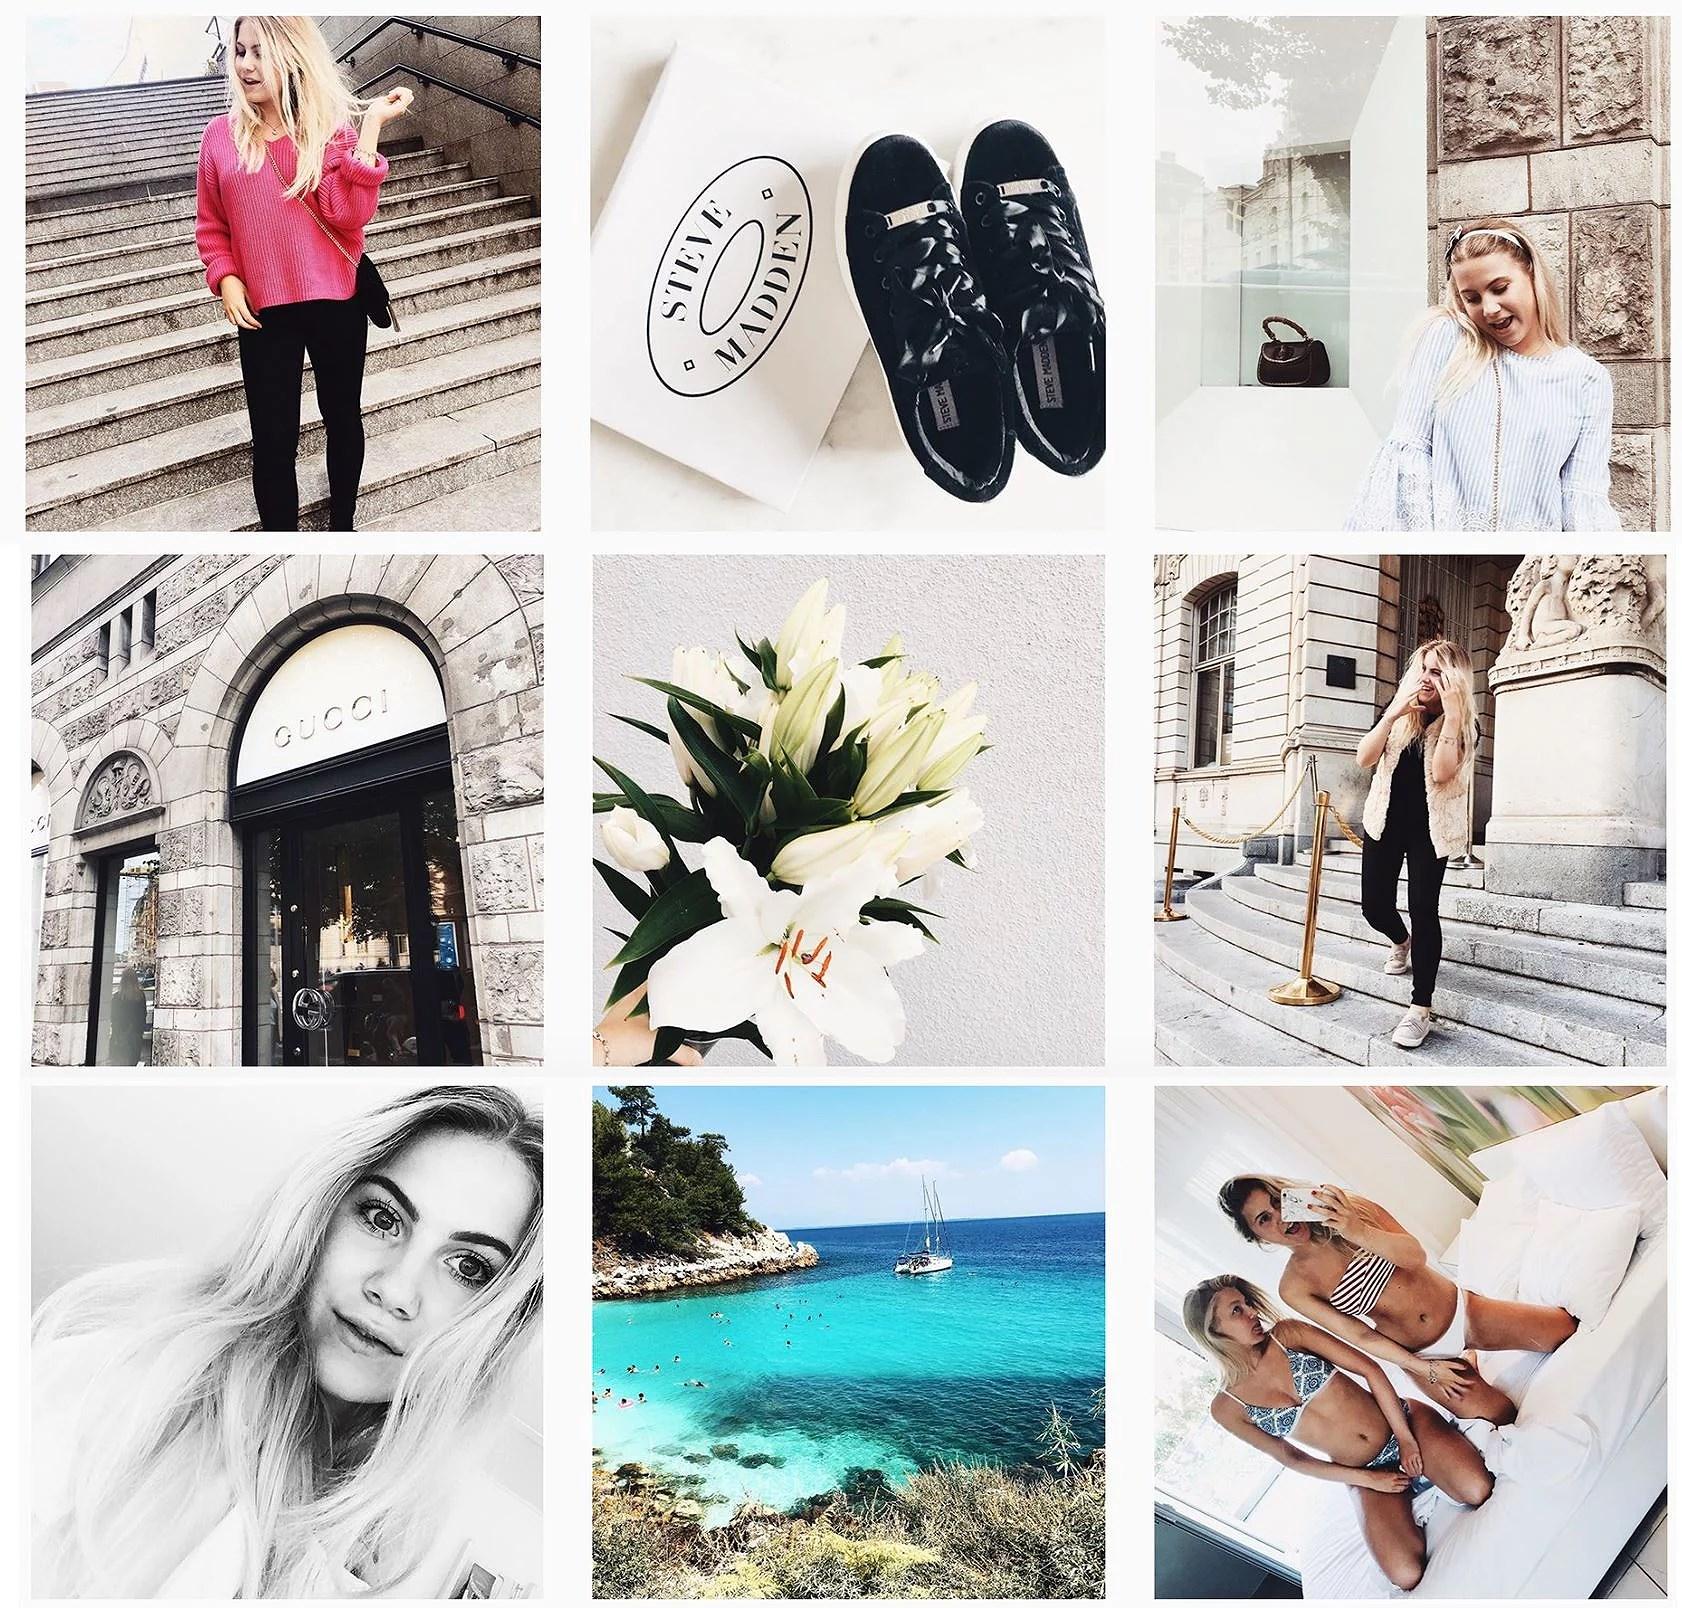 Latest on instagram